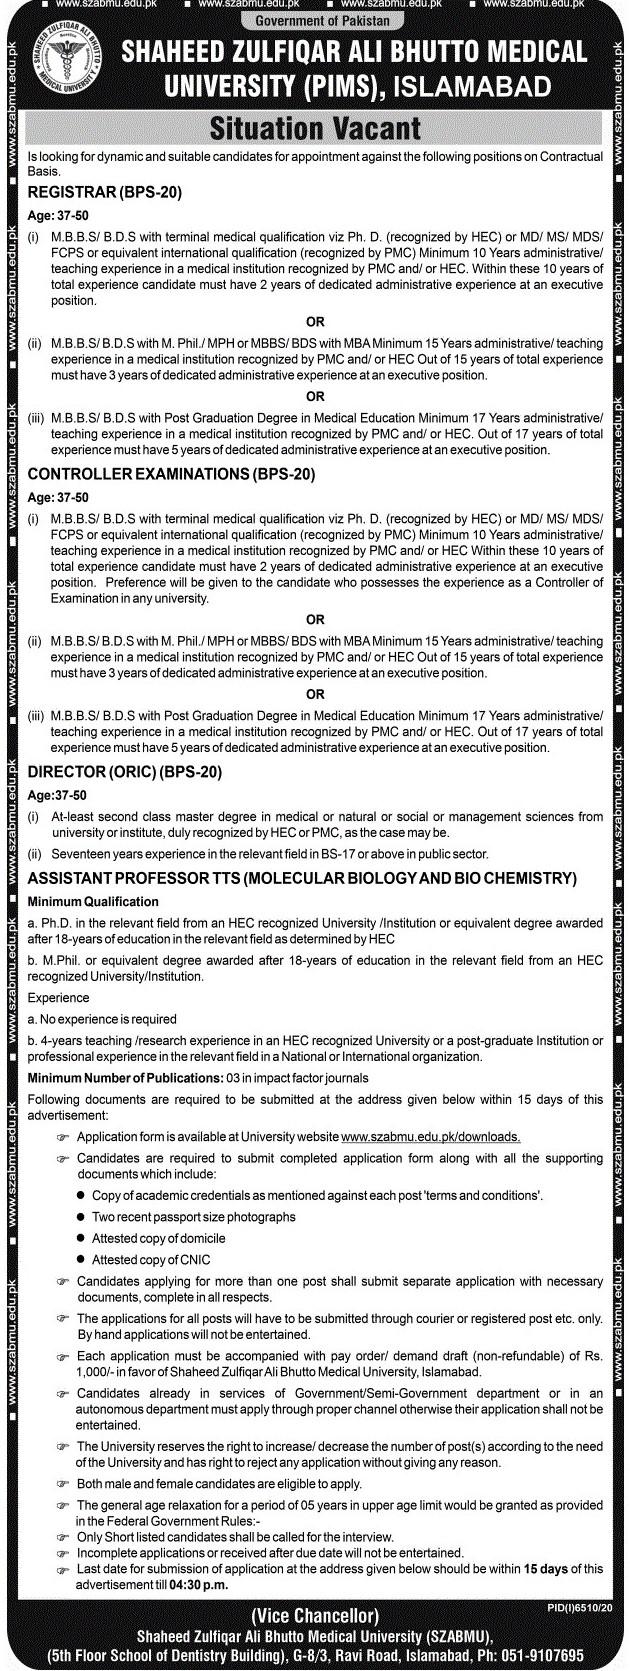 Shaheed Zulfiqar Ali Bhutto Medical University (PIMS) Jobs 2021 in Pakistan